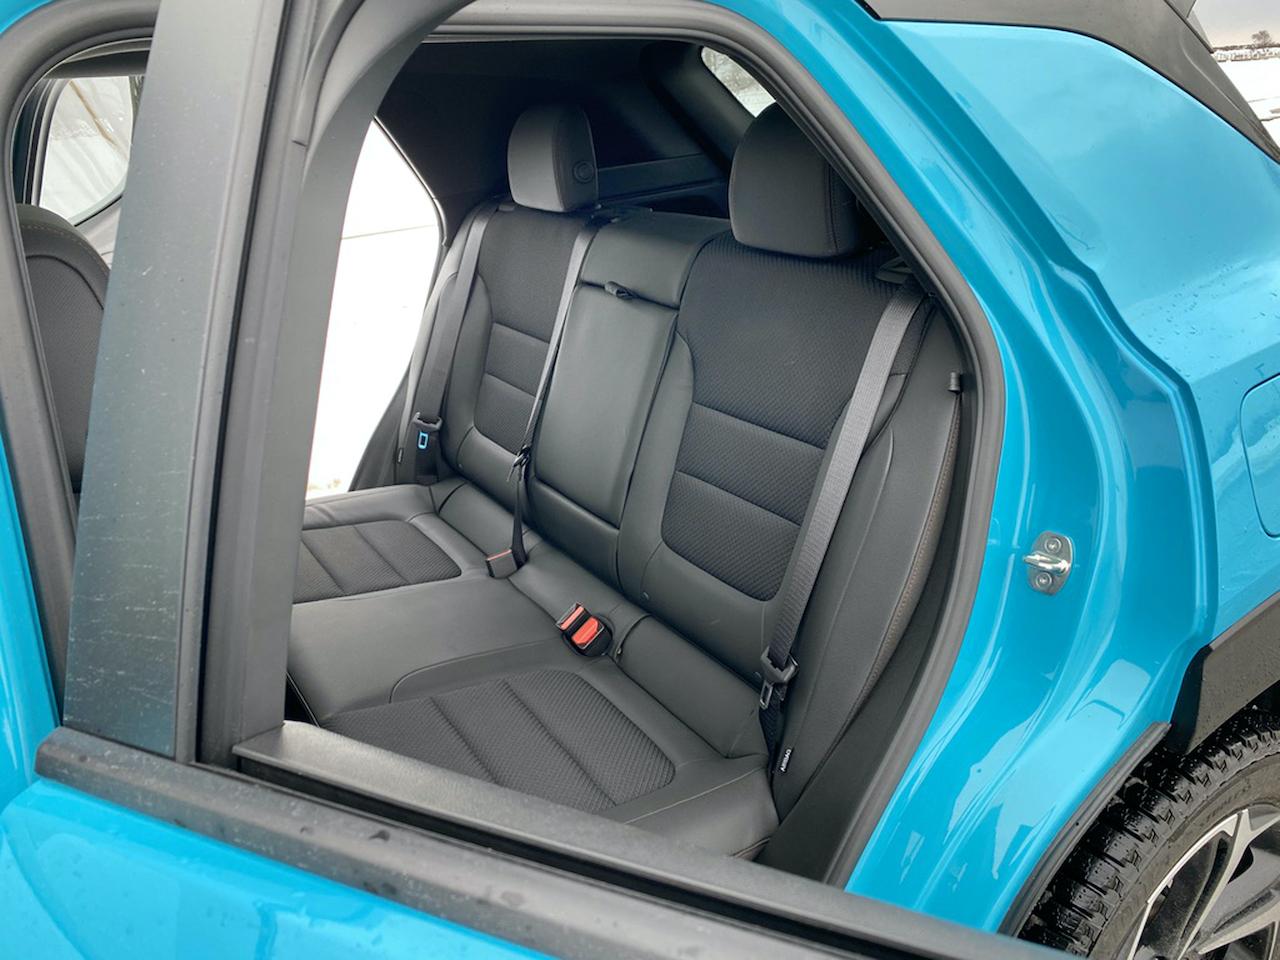 Review 2021 Chevrolet Trailblazer